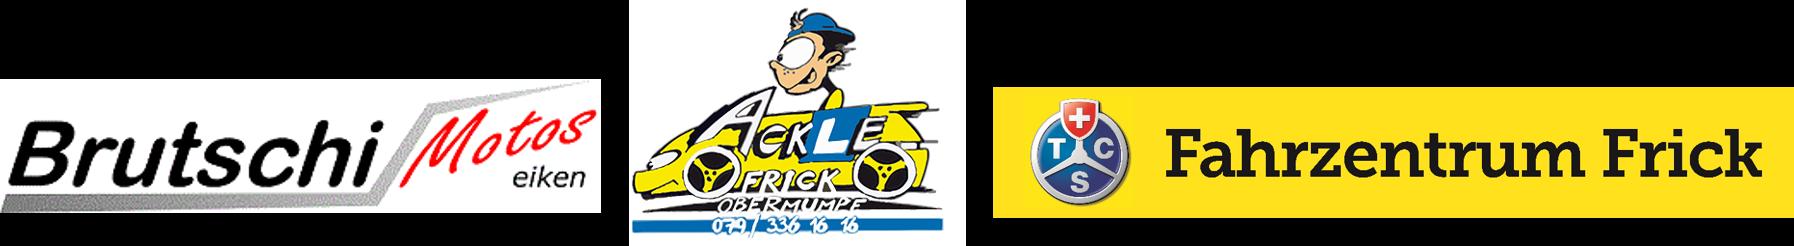 Fahrschule Ackle, Frick, Logo